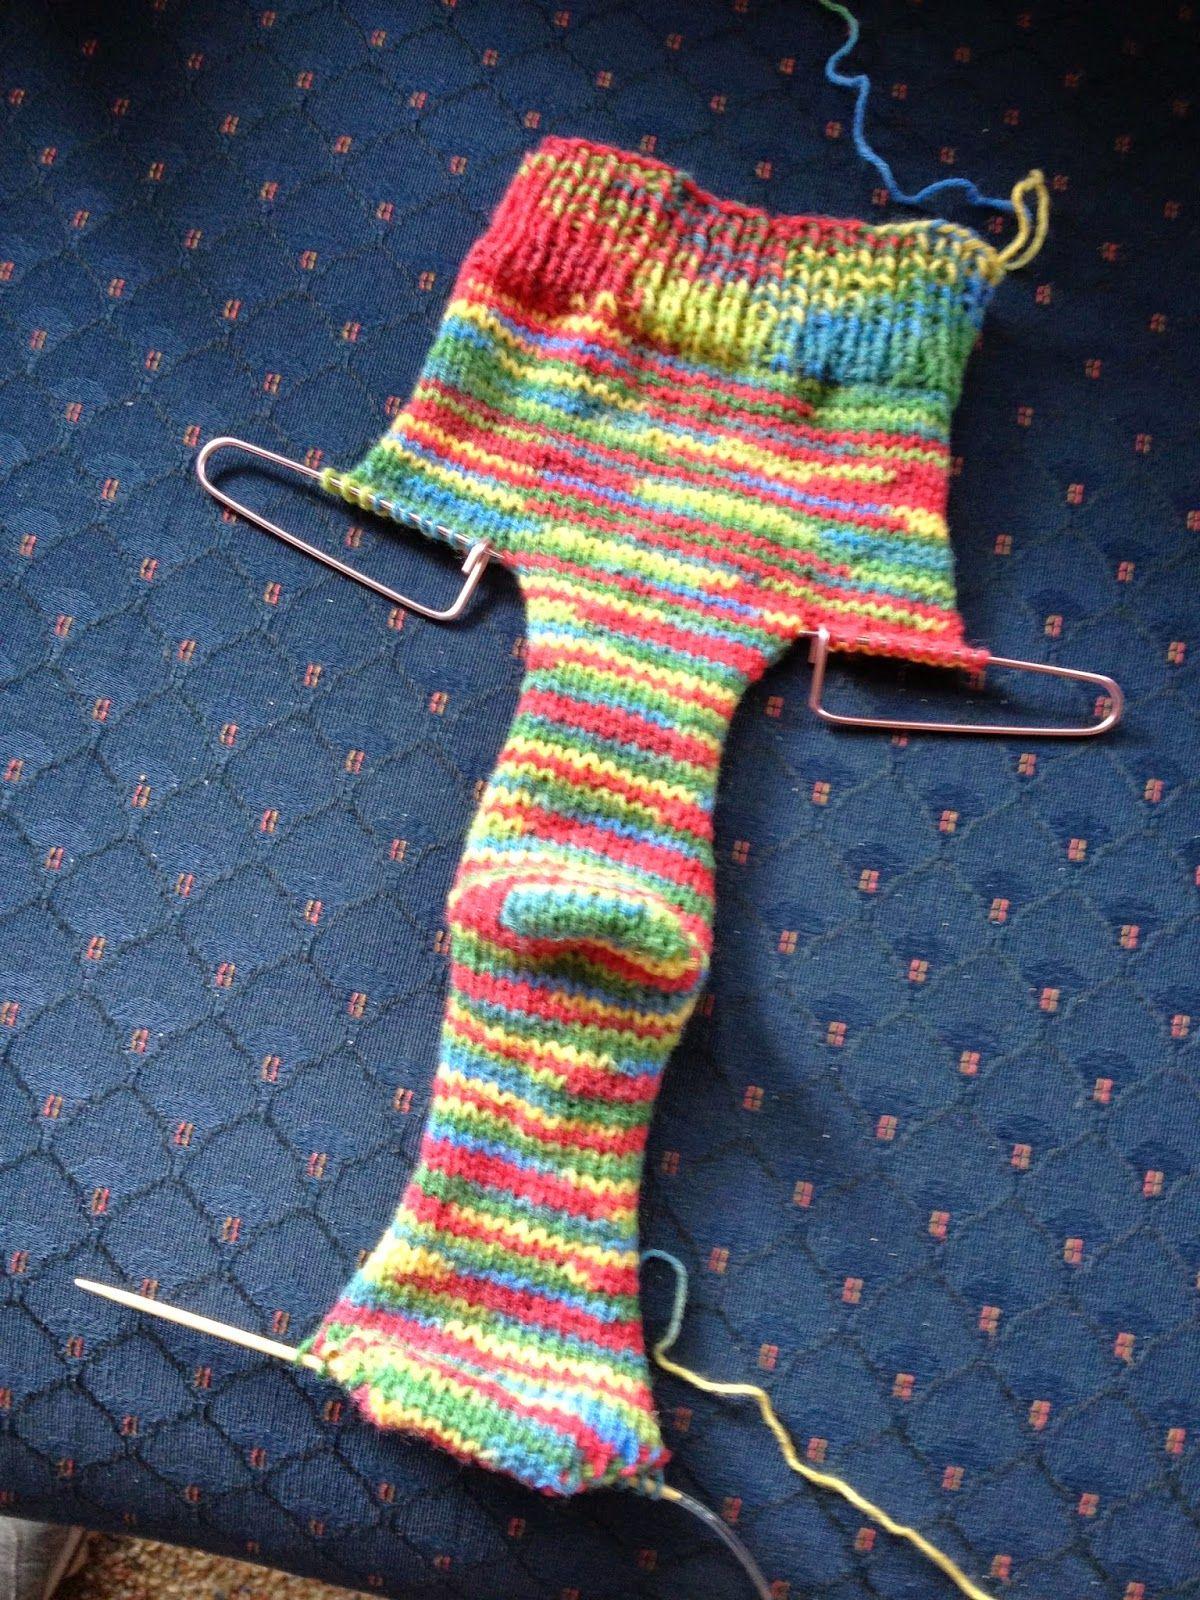 Free!) Two Needle Socks Knit Pattern. Killer Crafts & Crafty Killers - Free Printable Fleece Sock Pattern